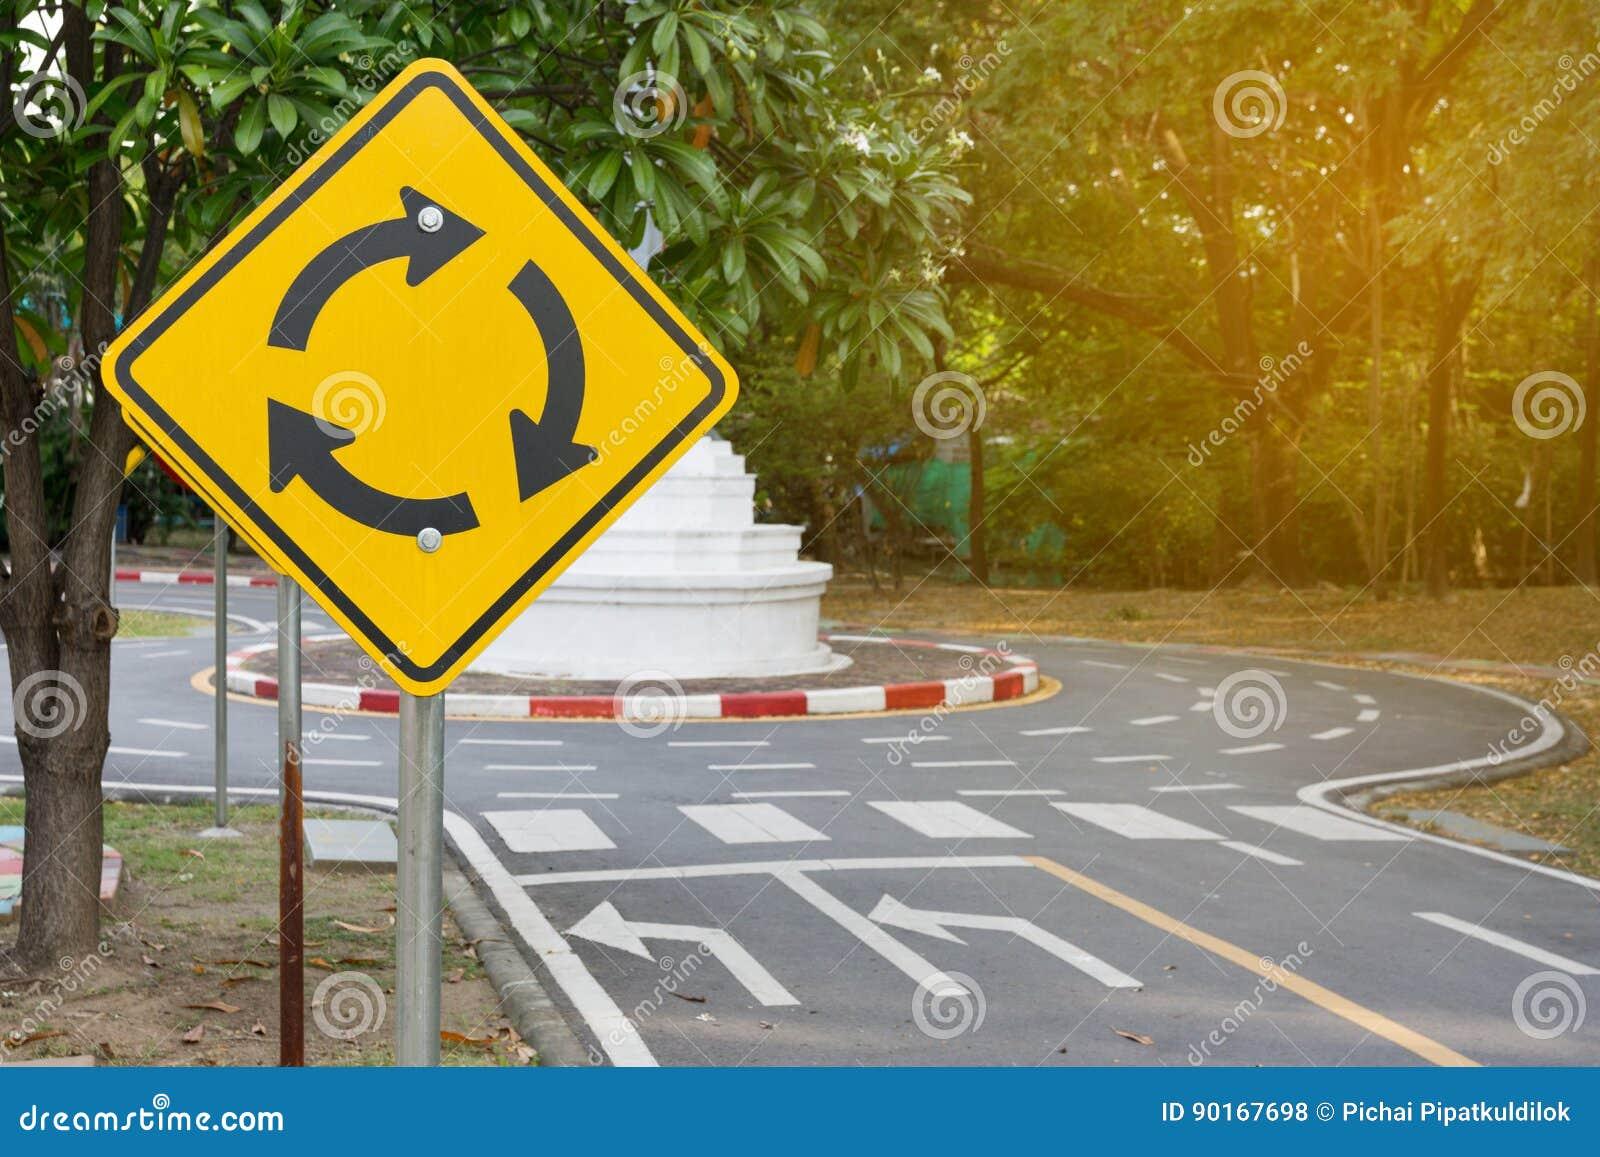 Trafikkaruselltecken